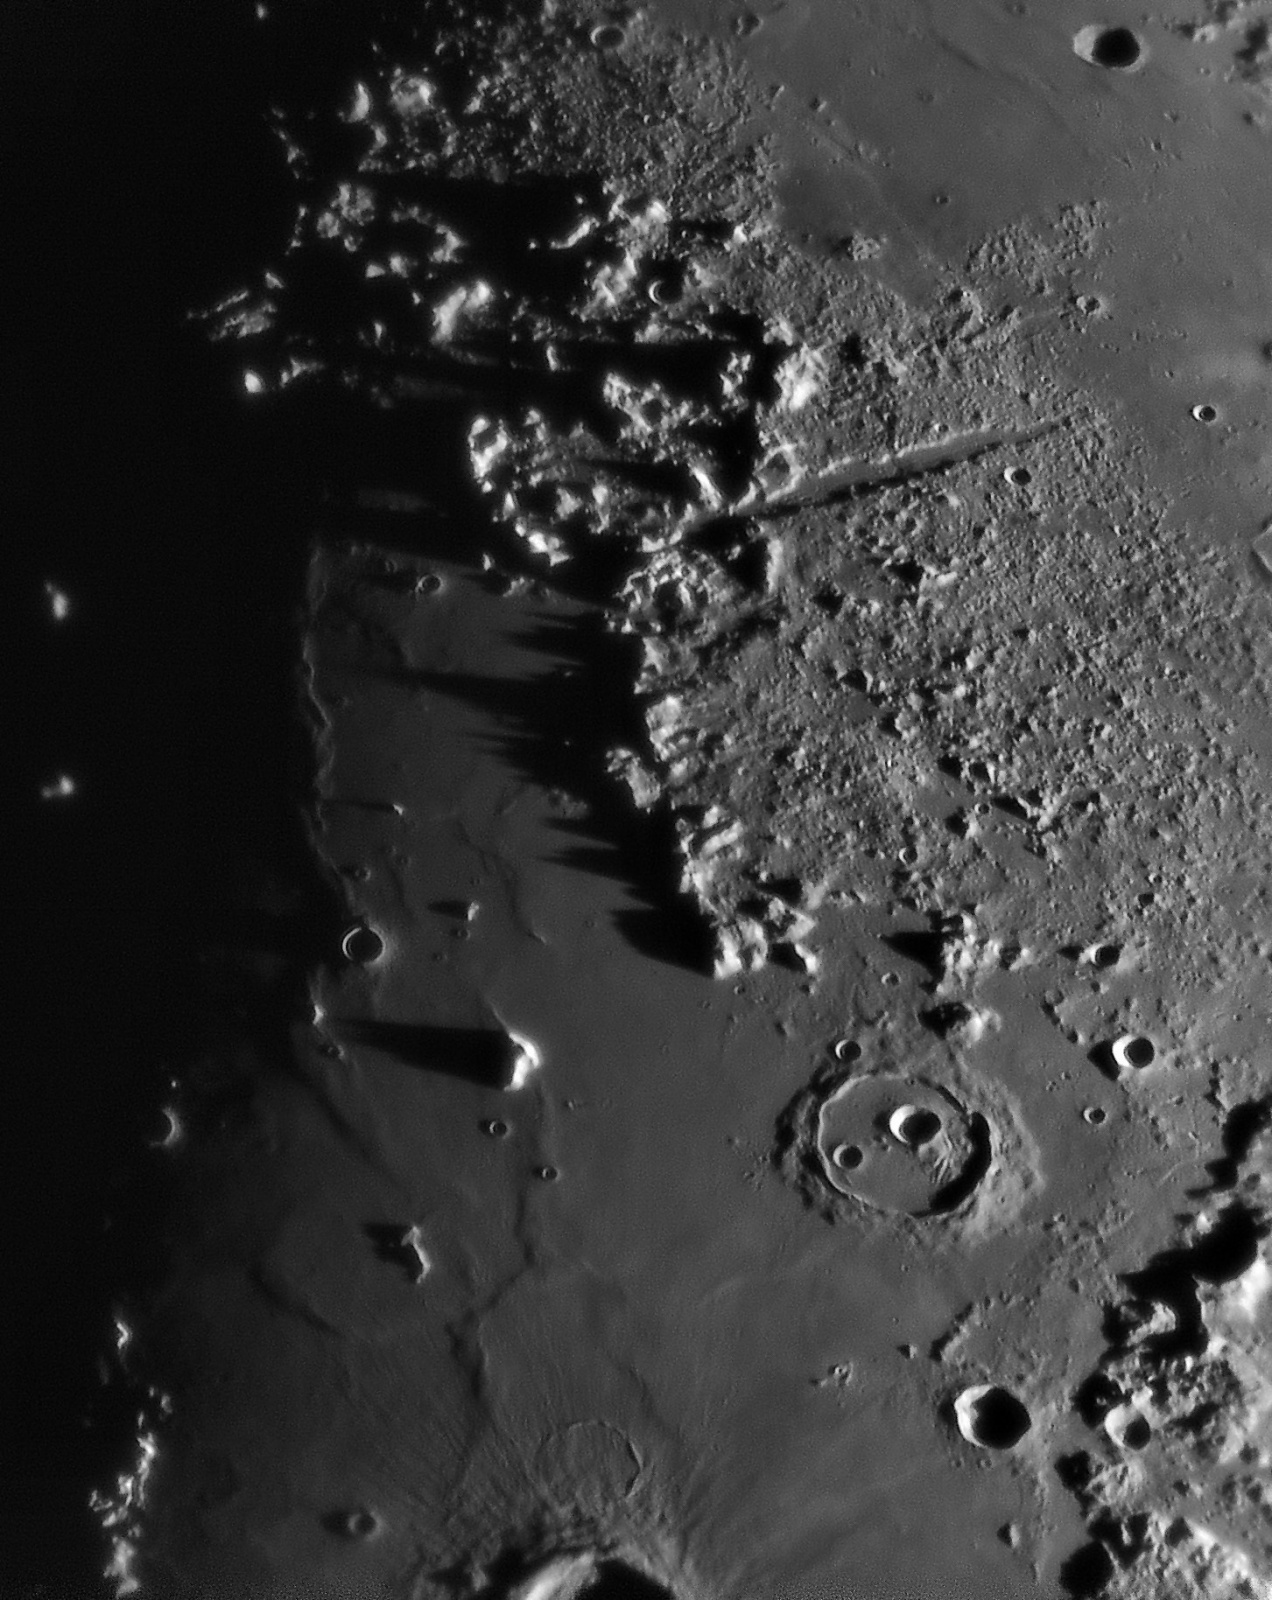 Moon 20191204_194019_g4_ap497_conv pop.jpg